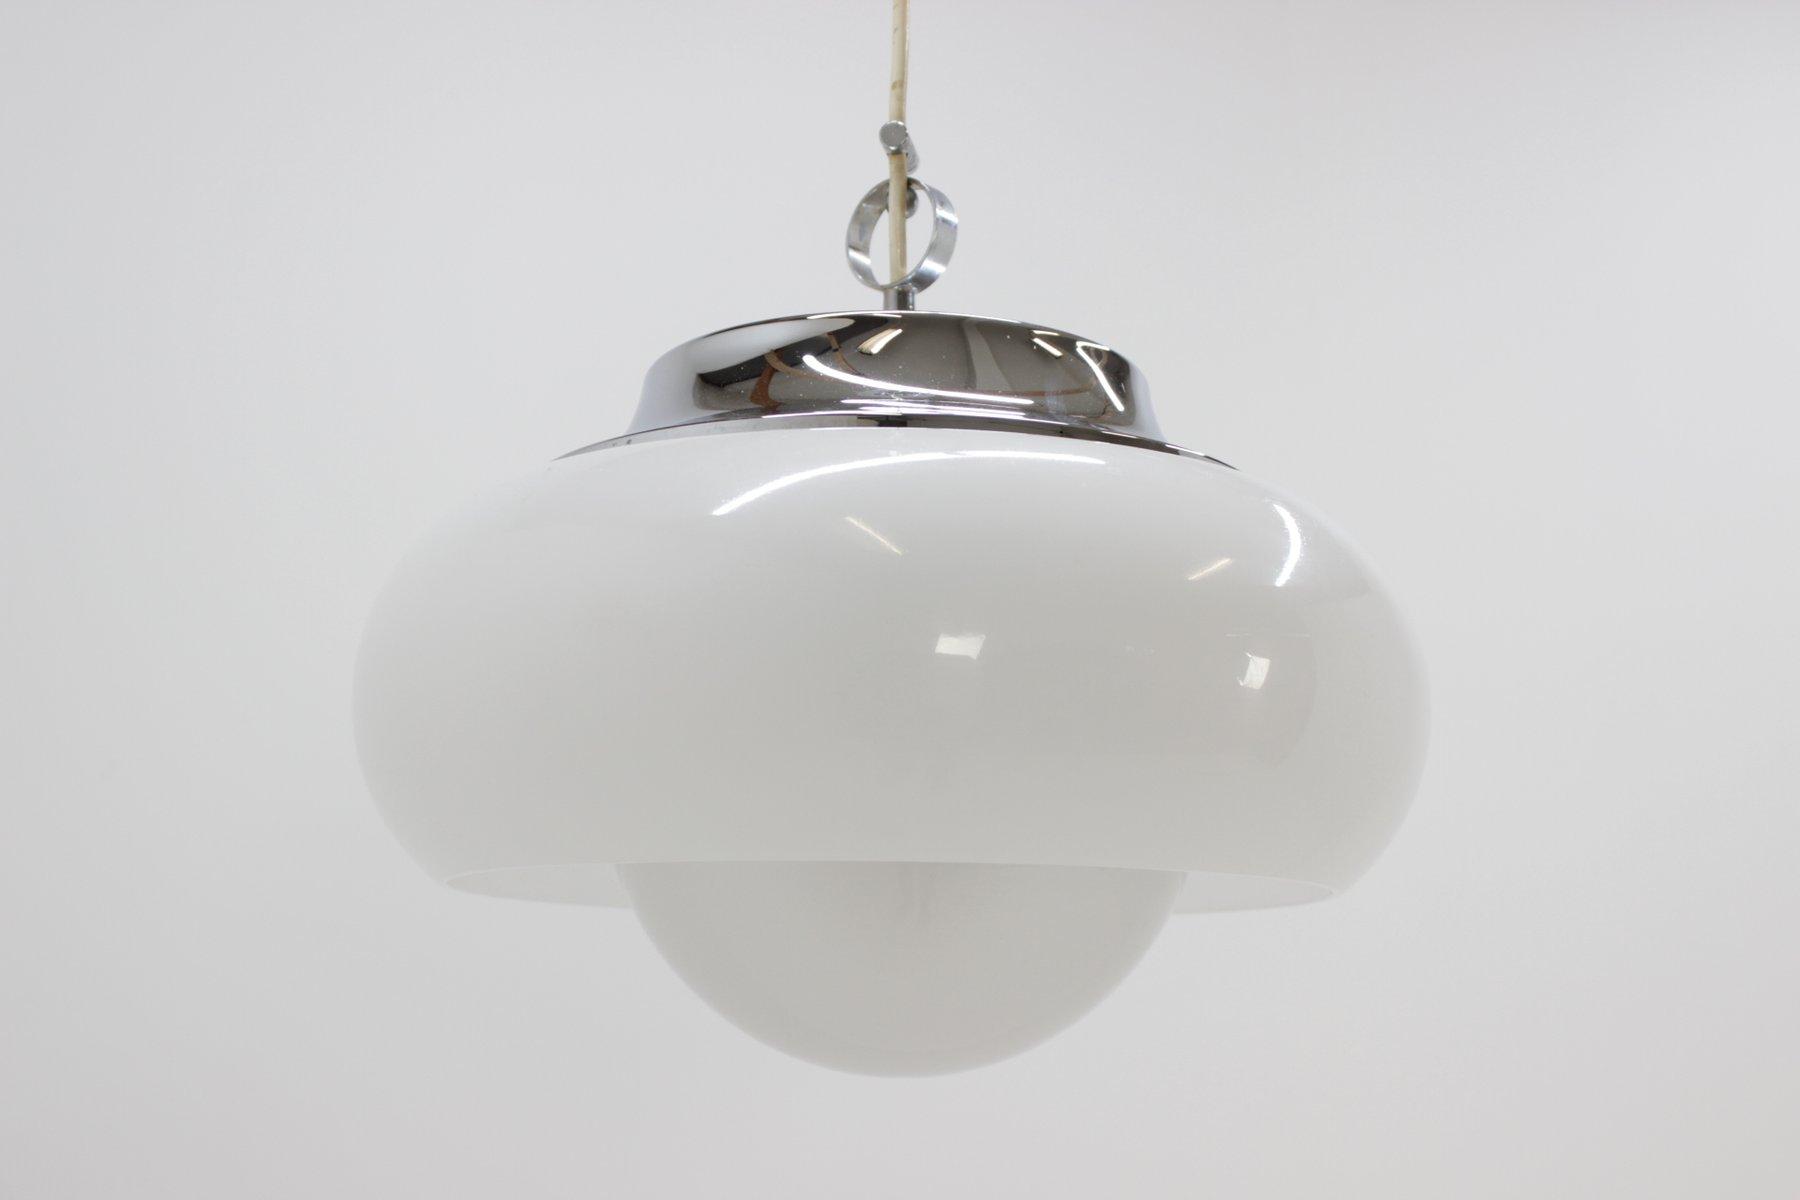 Lampadario guzzini vintage lampadario harveiluce i guzzini